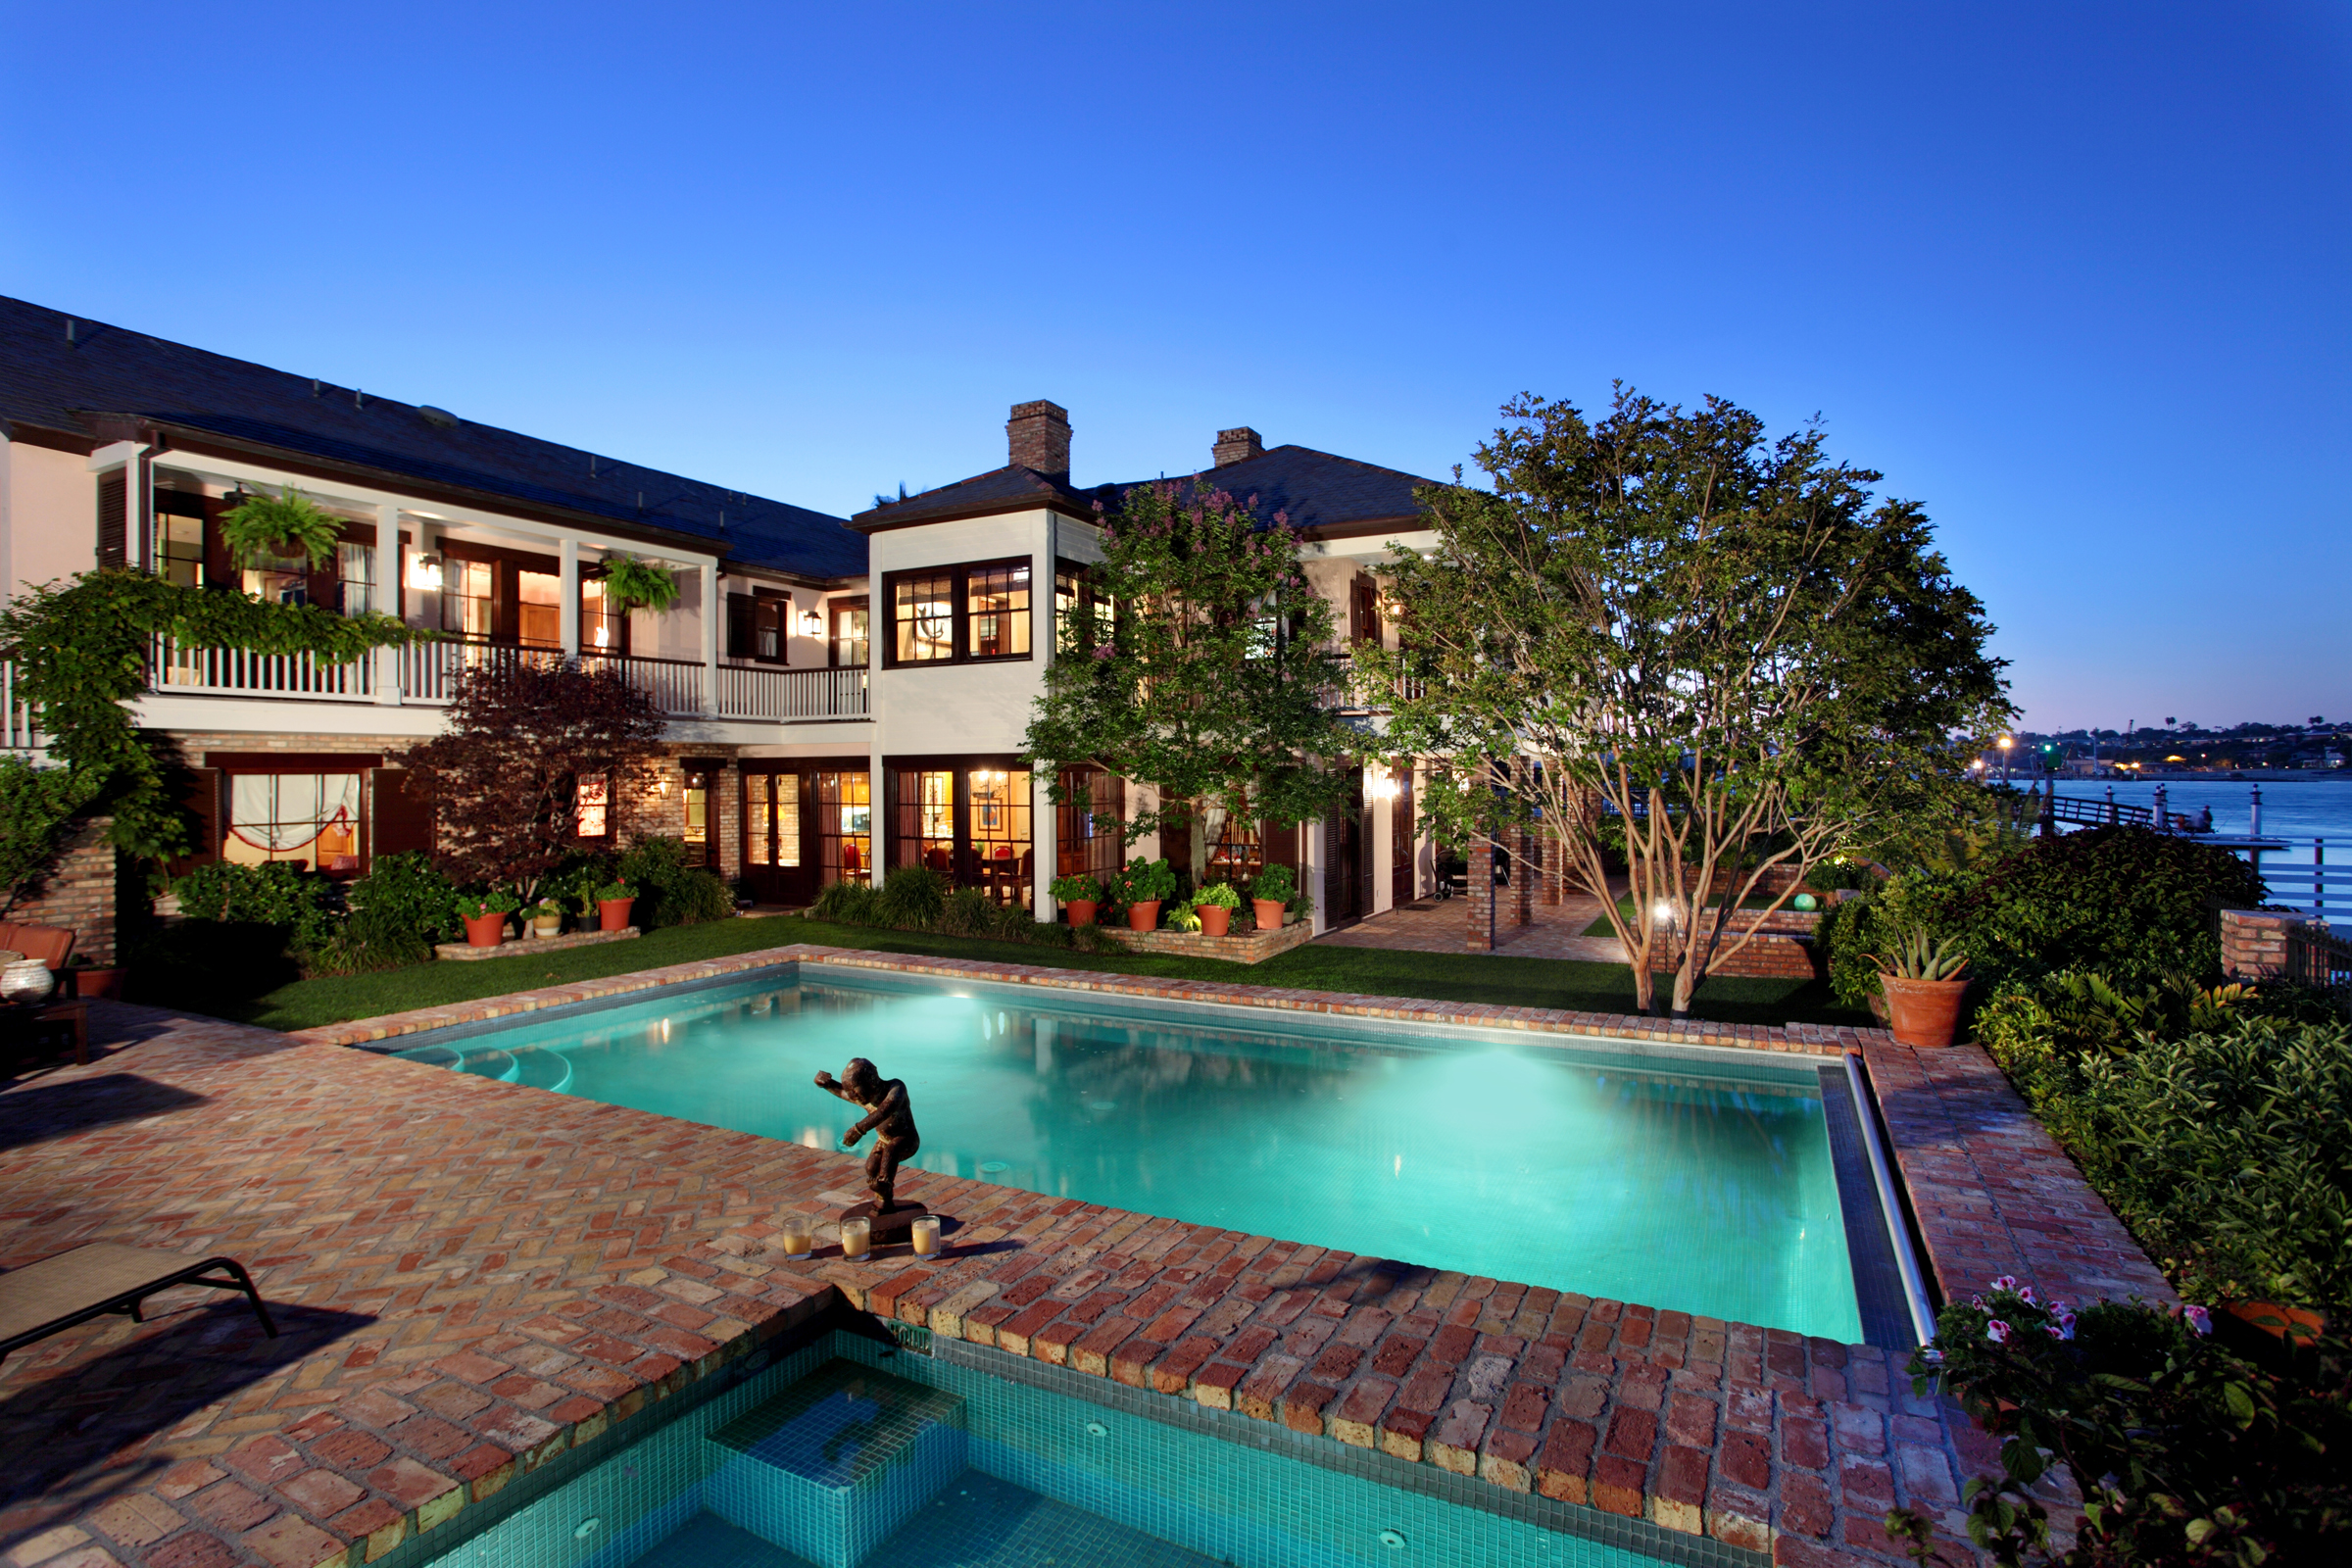 Newport Beach Homes   HD Wallpapers   Newport Beach Homes 2400x1600